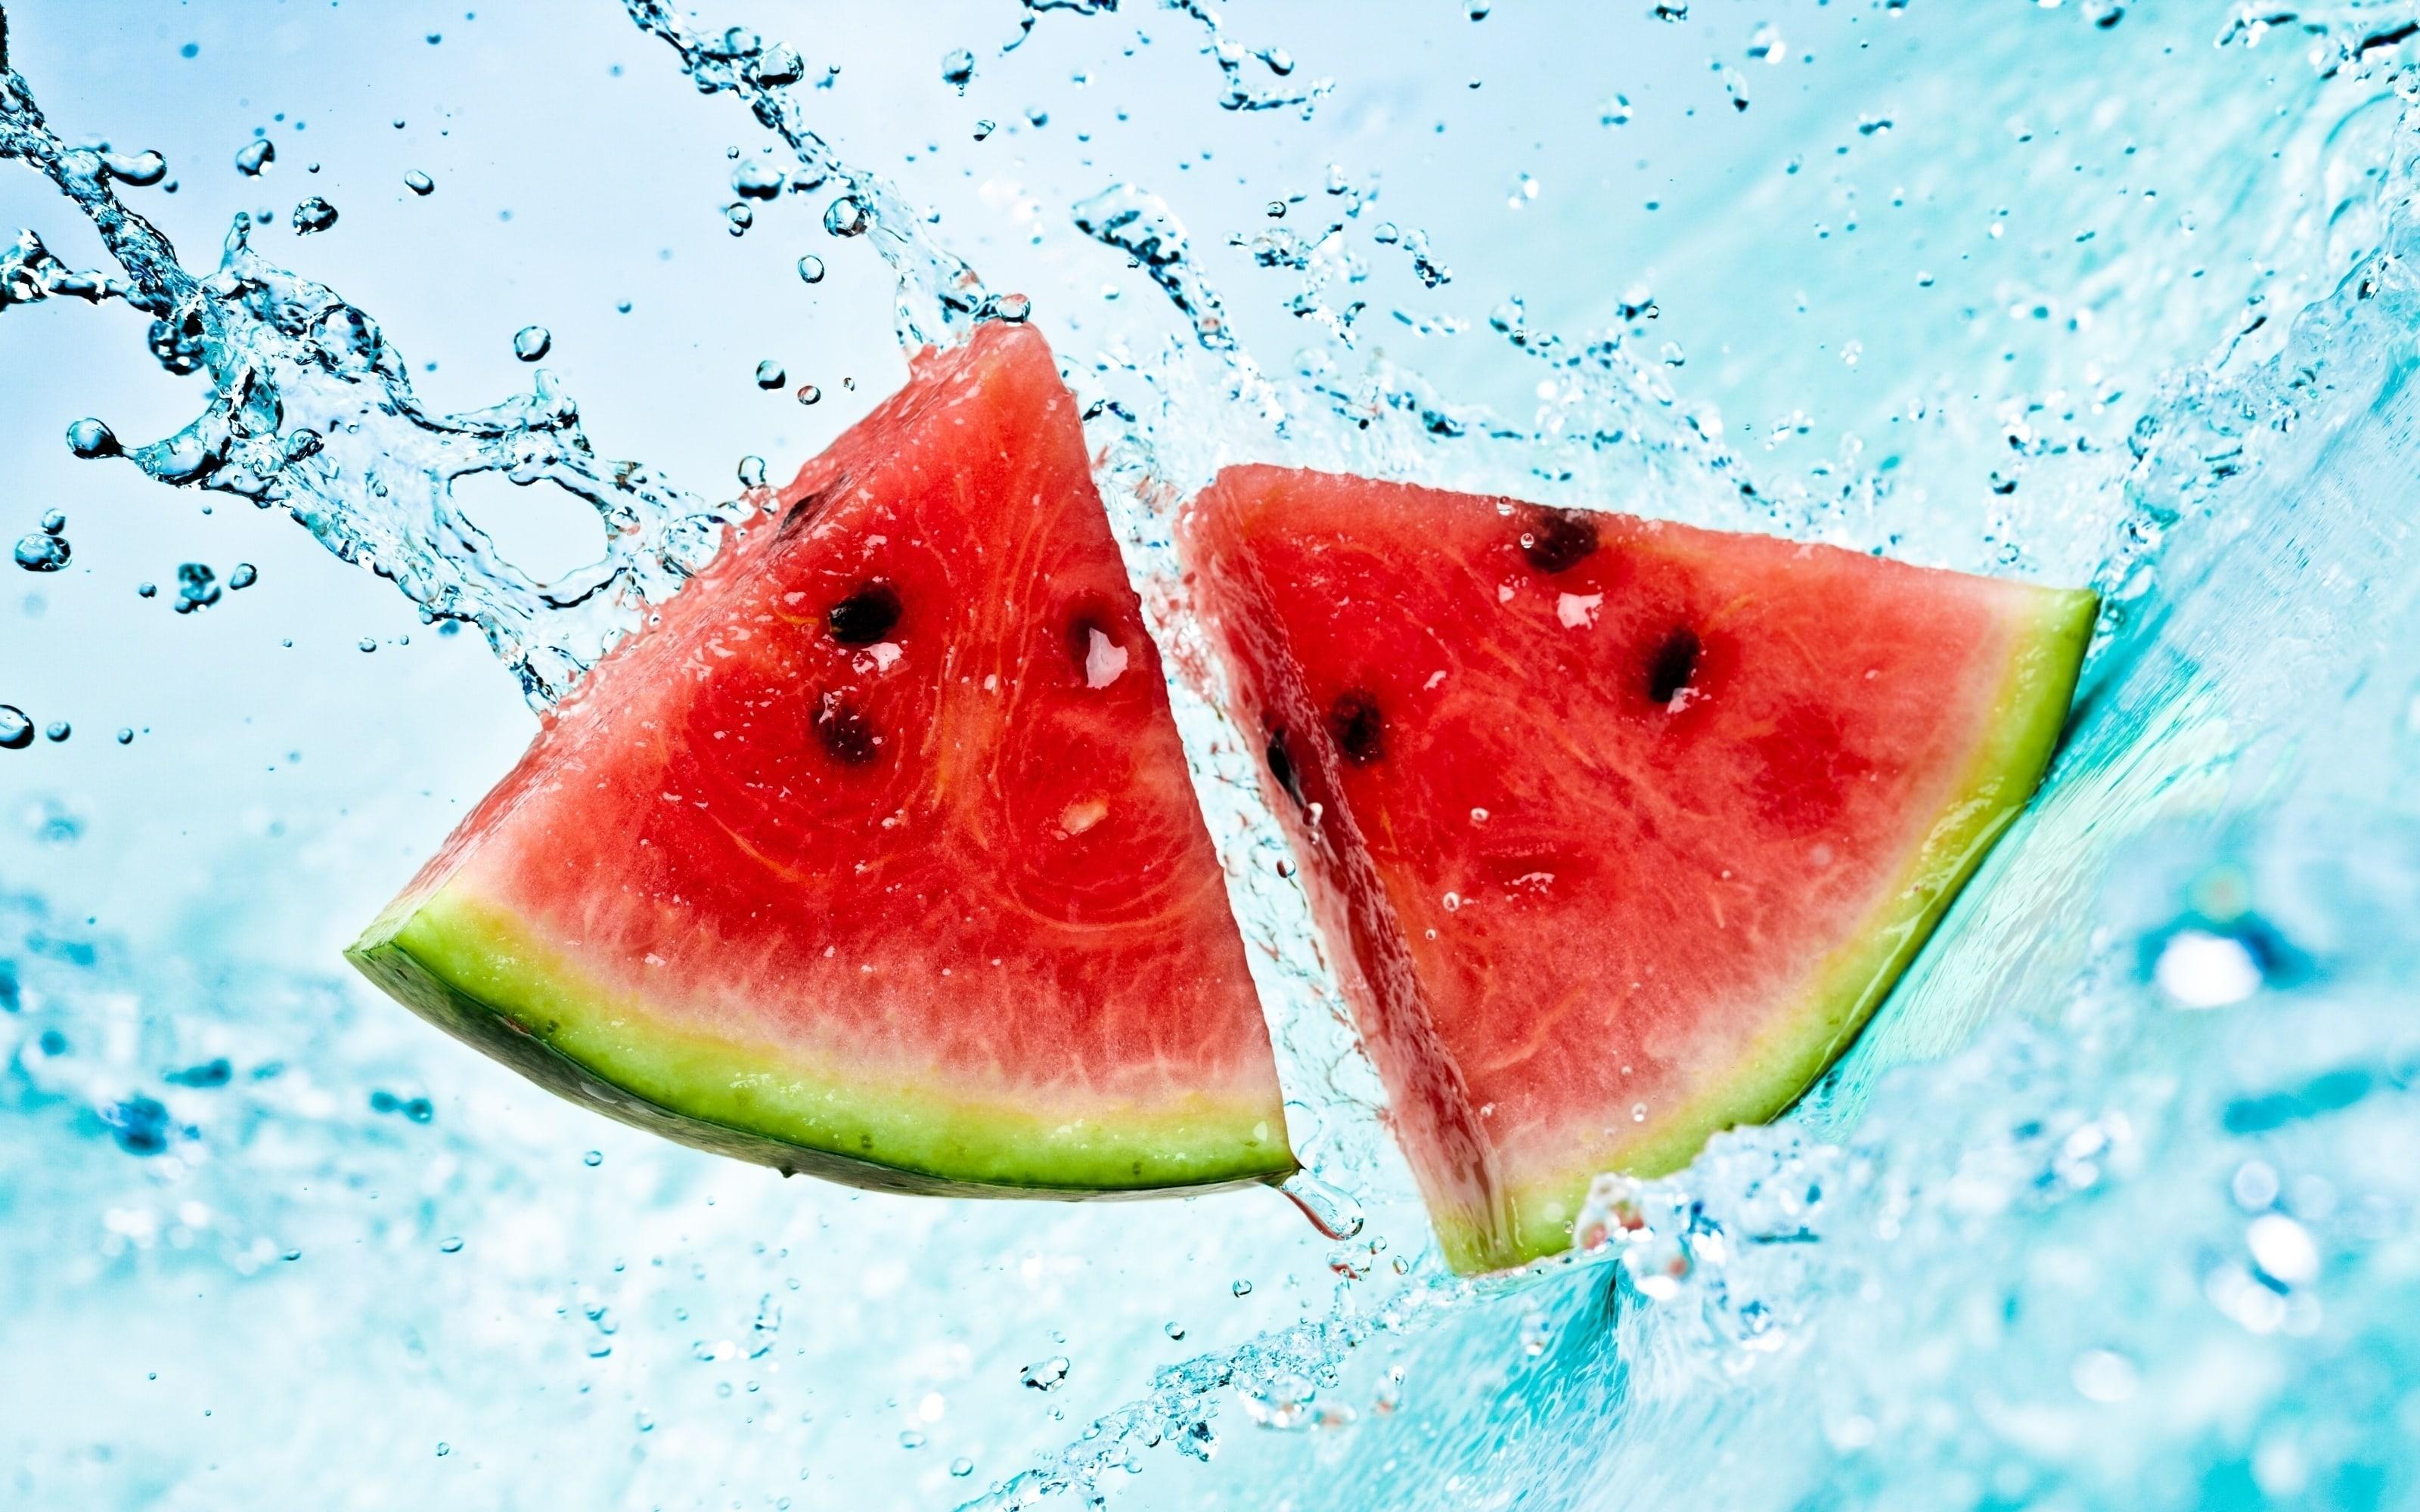 Watermelon desktop wallpapers